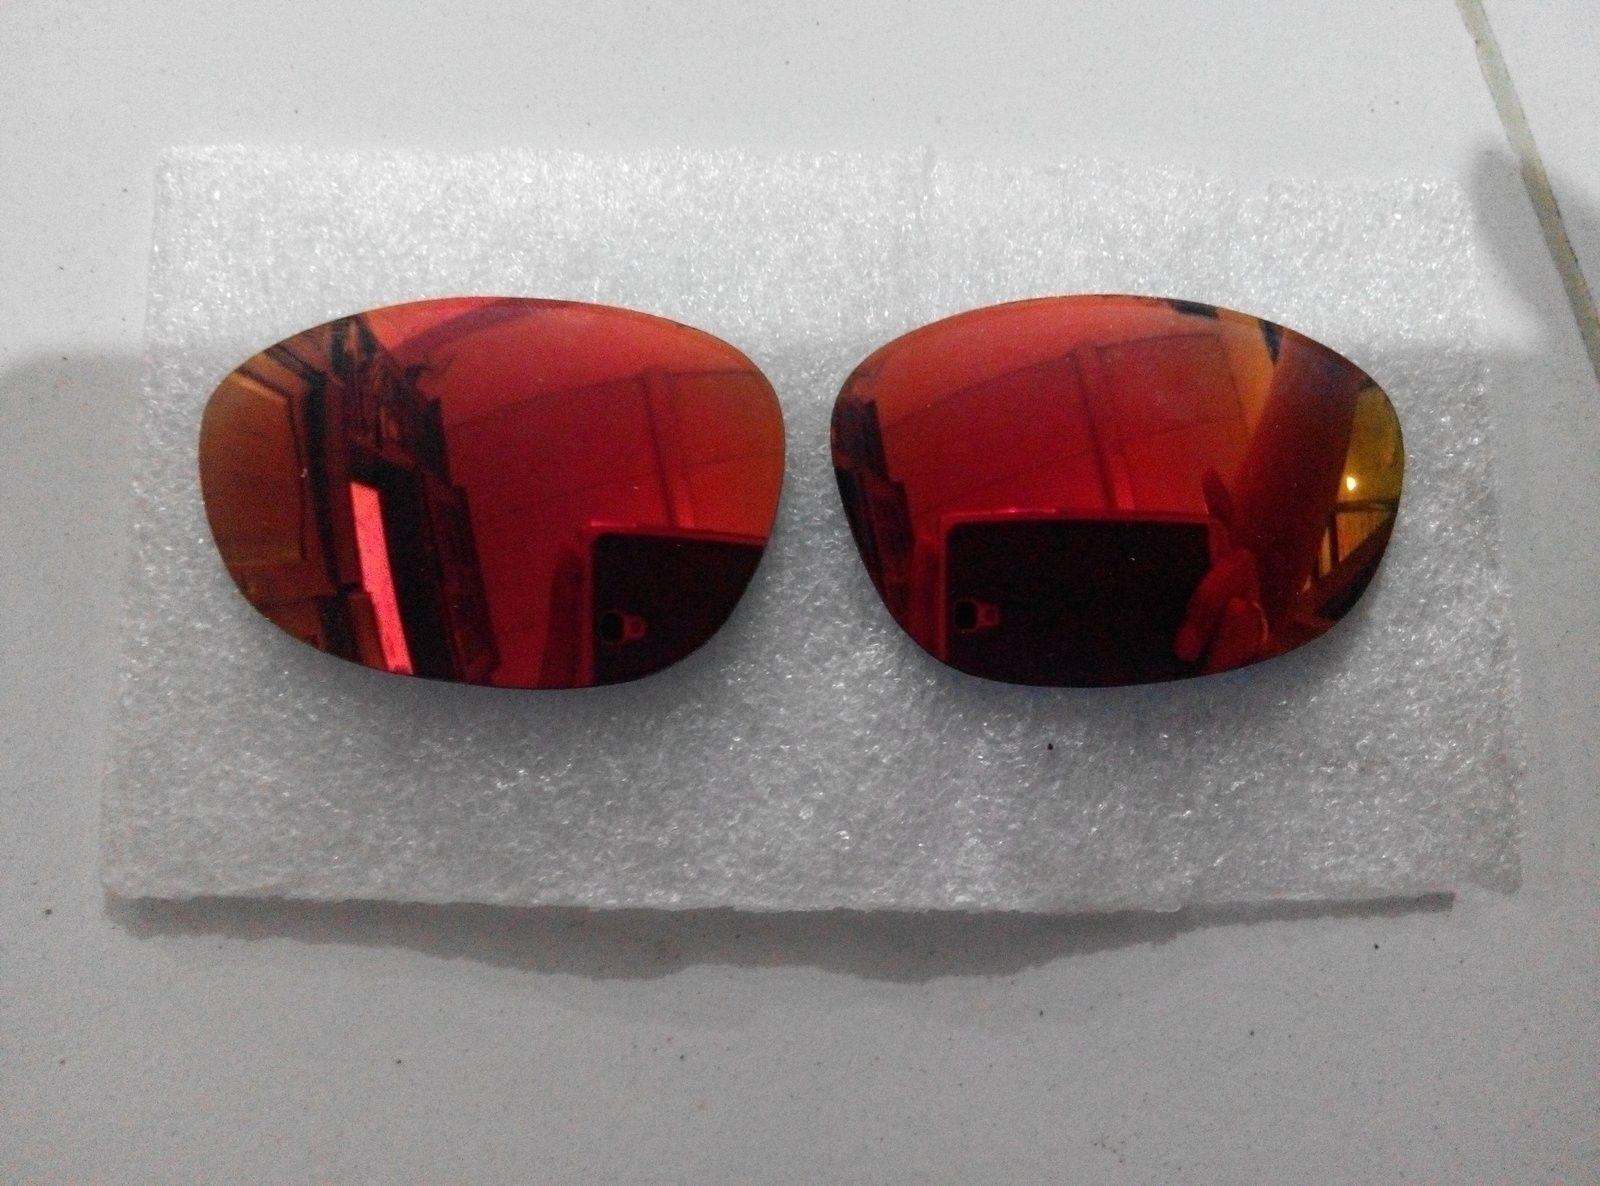 Xx xmetal ruby iridium replacement lens - IMG_20141217_174023.jpg